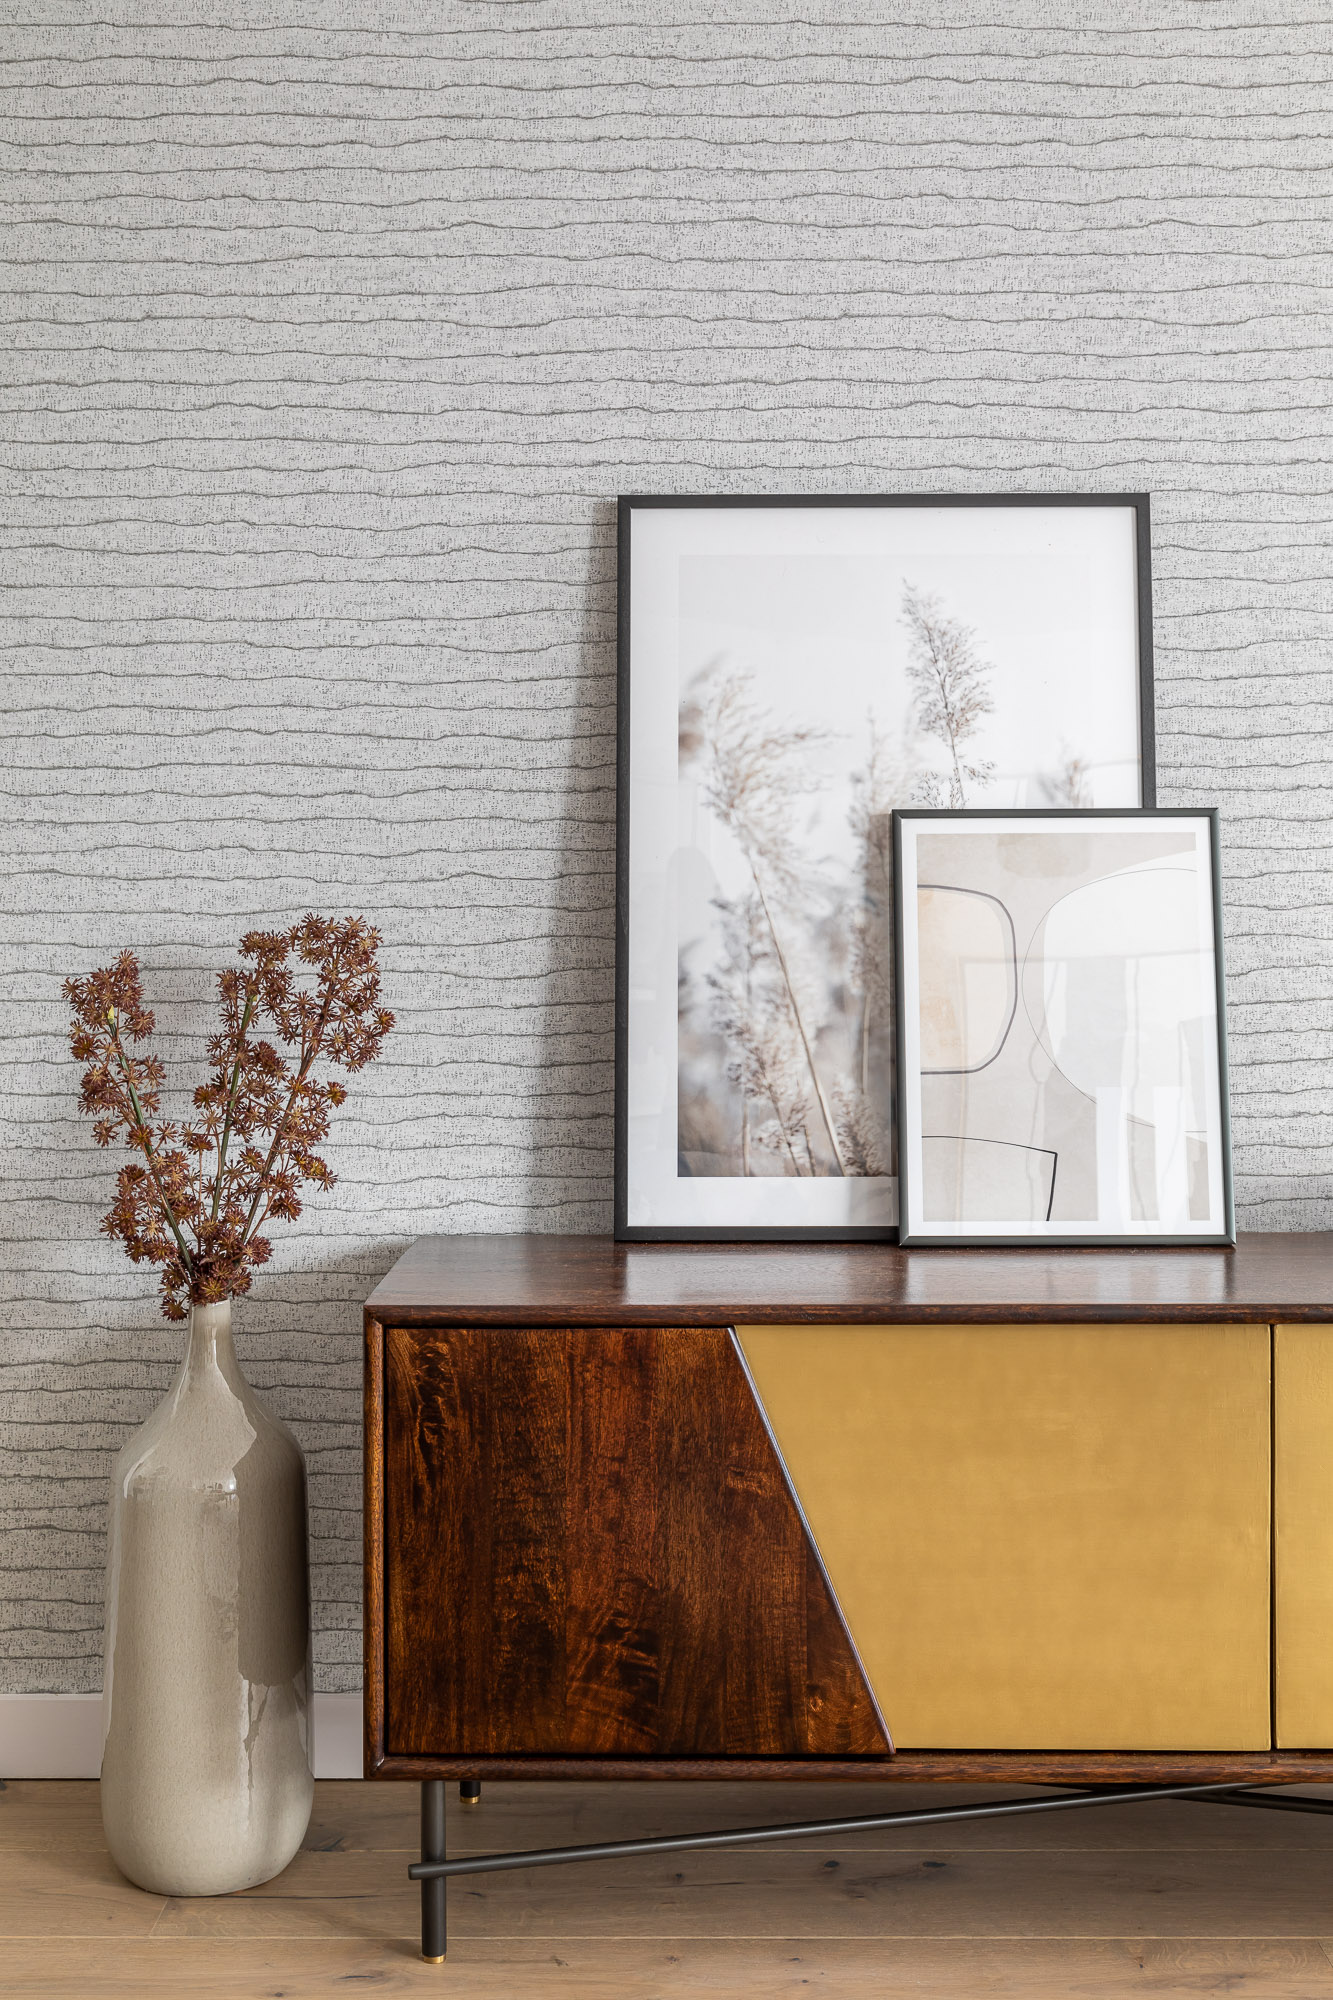 jonathan bond, interior photographer, side cabinet & pictures, putney london